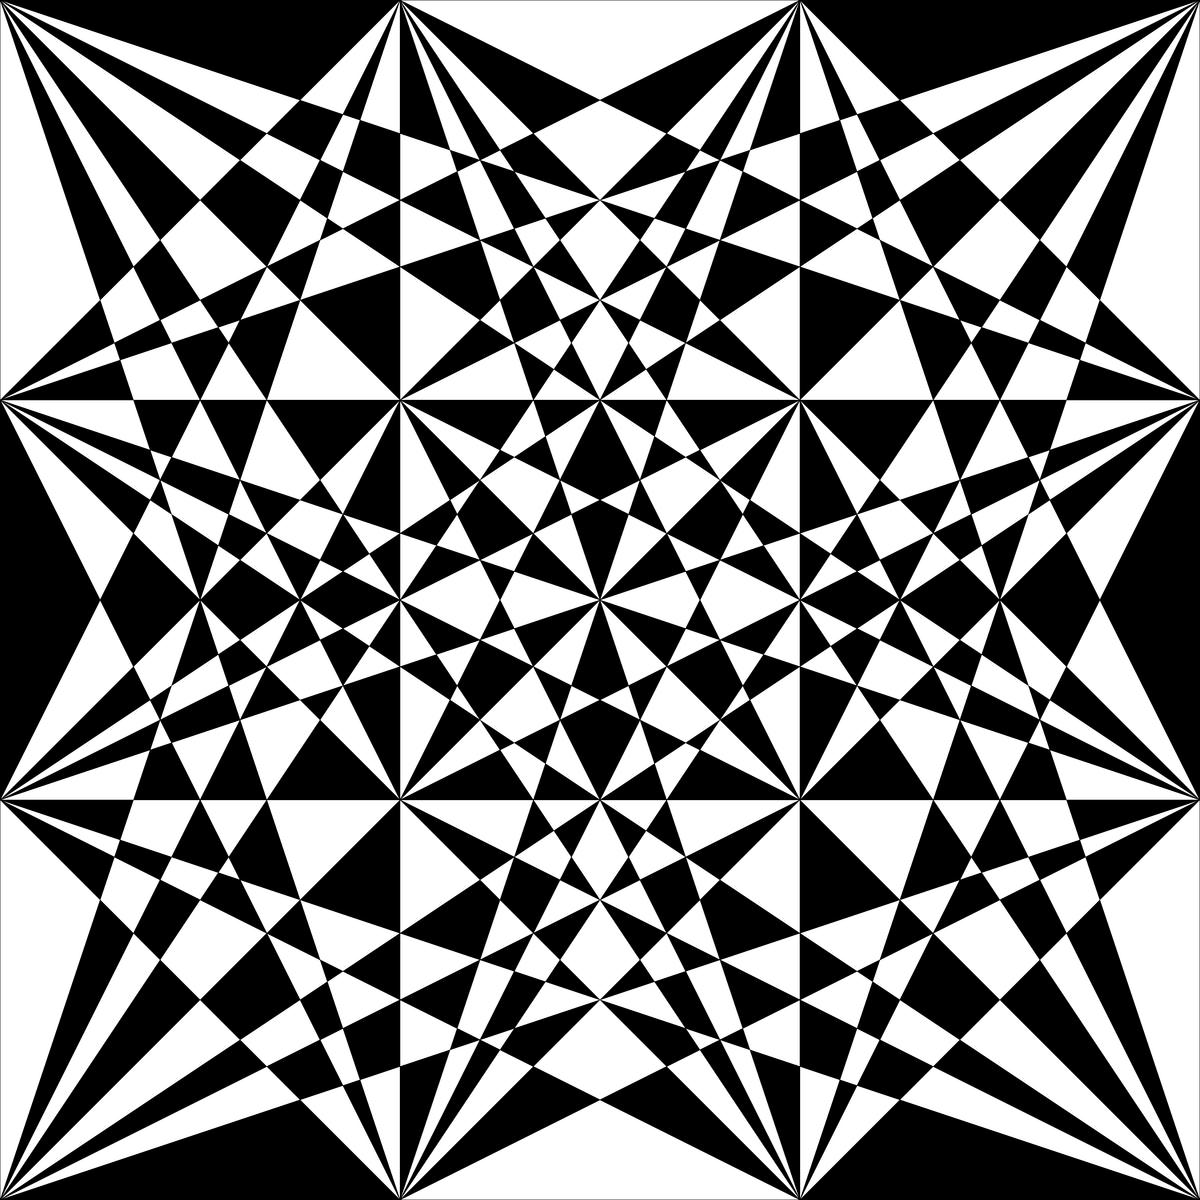 f:id:Hassium277:20200215194823p:plain